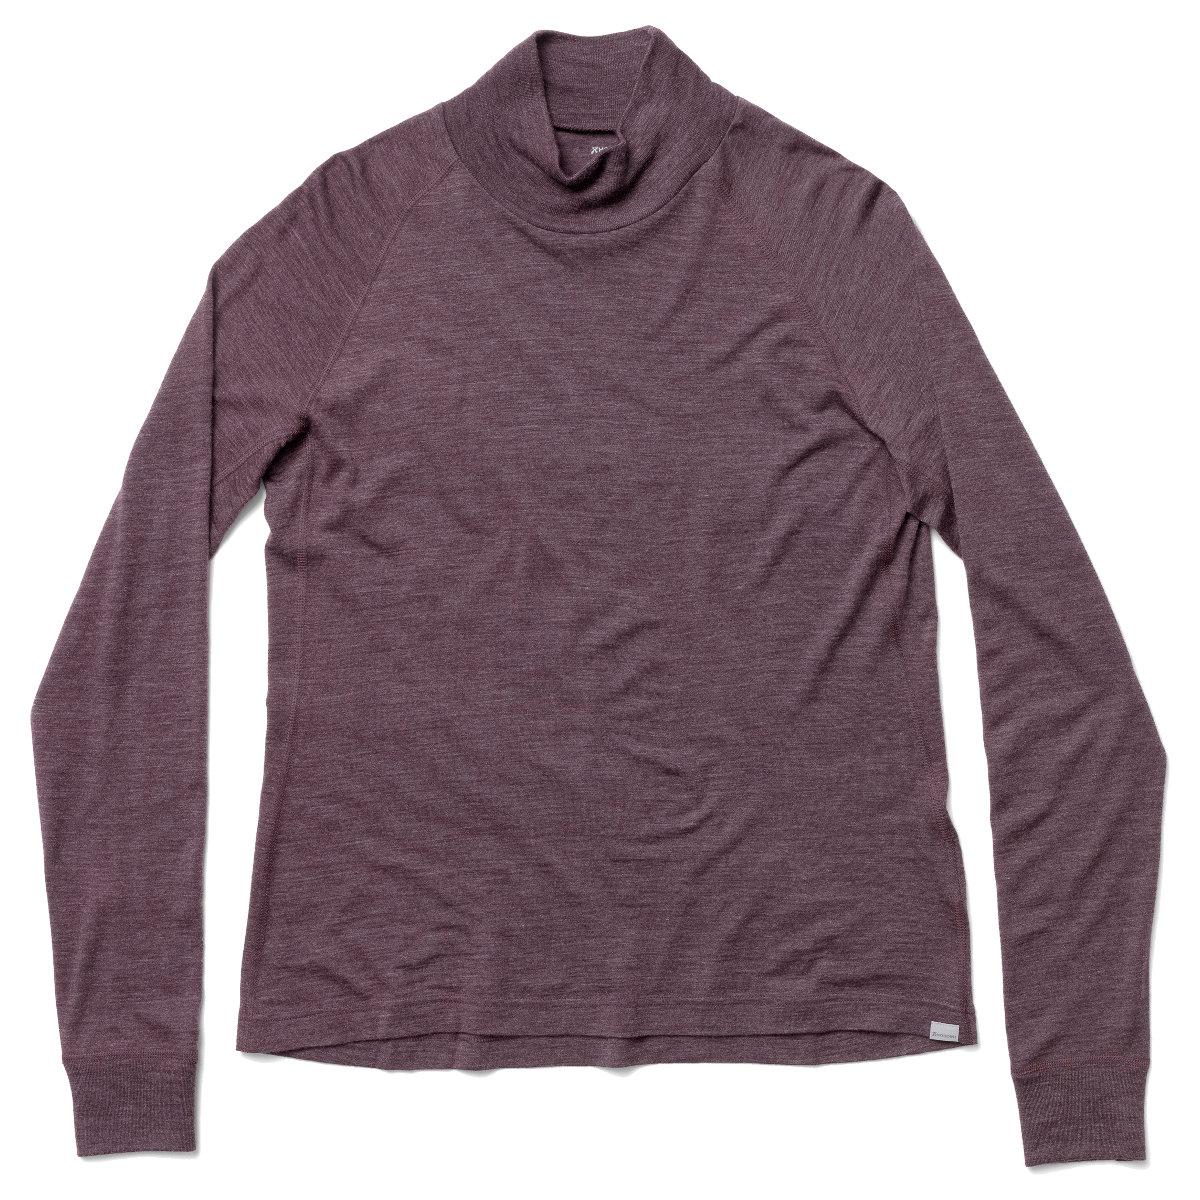 Houdini Women's Activist Turtleneck Long-Sleeve Shirt - Red Illusion